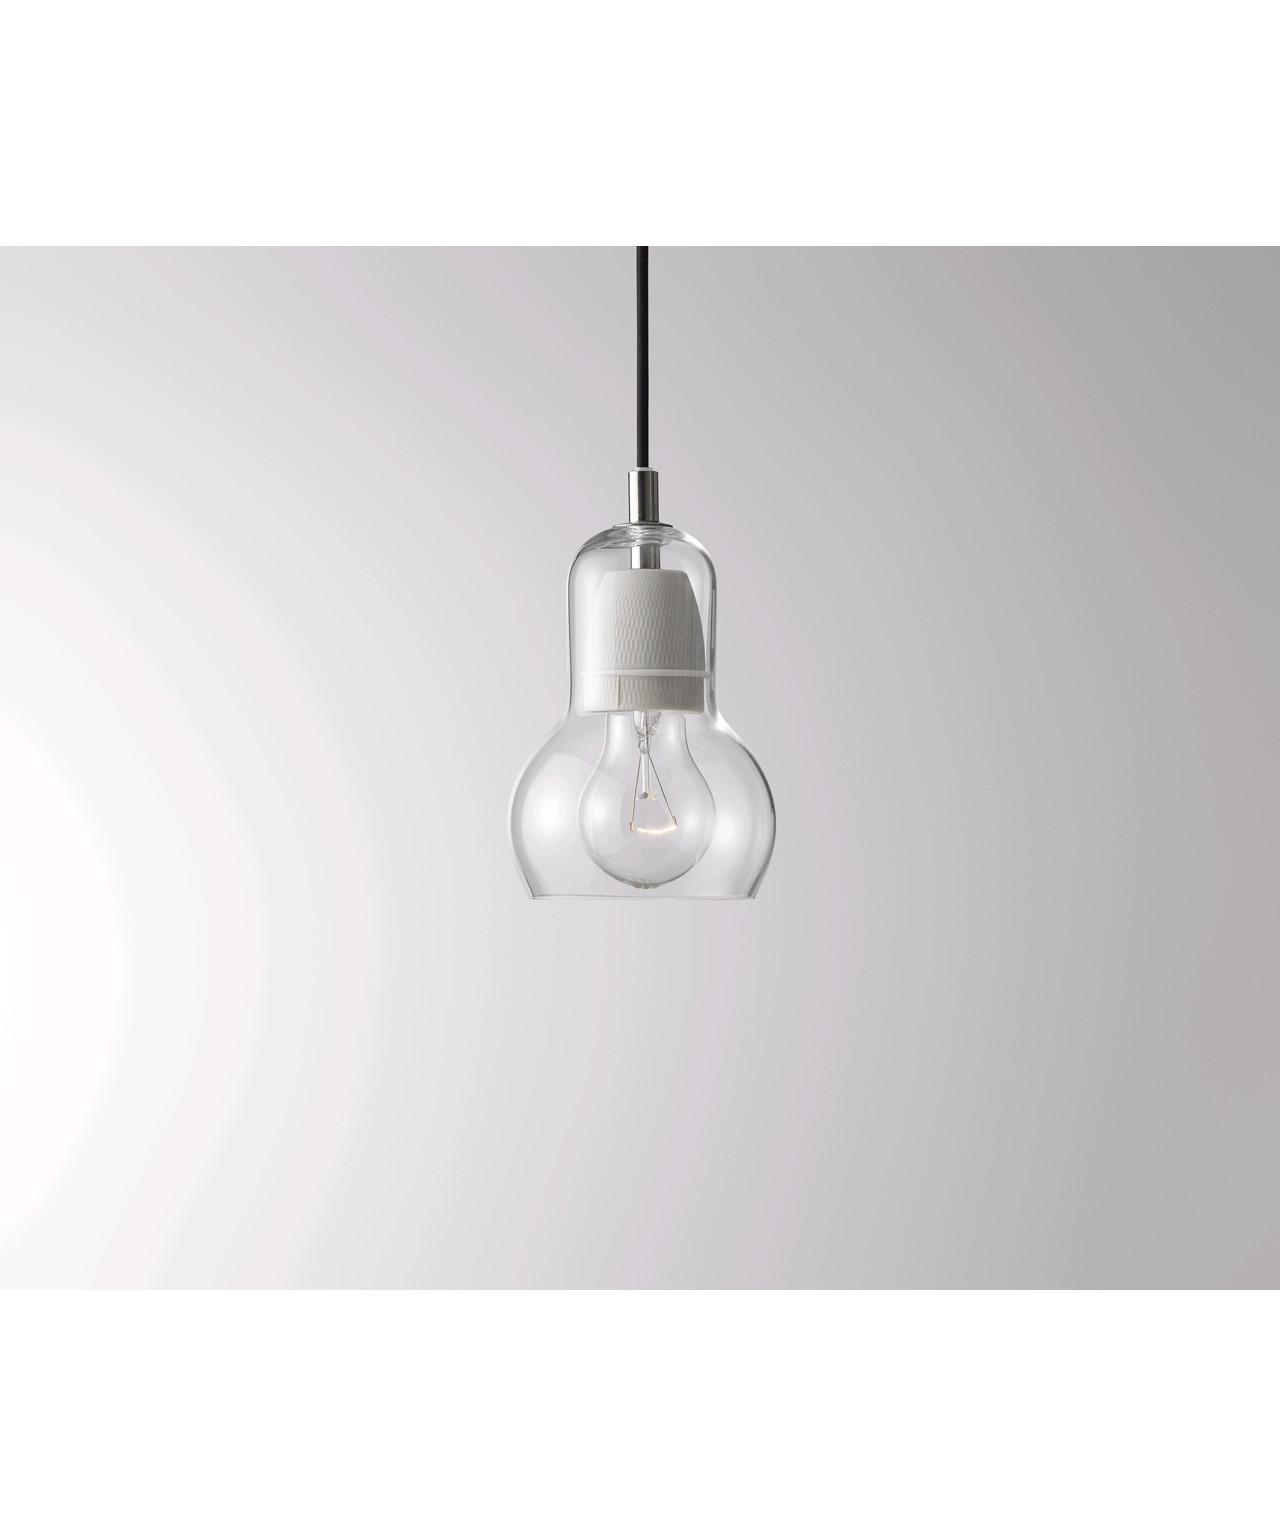 Image of Bulb SR1 Pendel - &tradition (4460659)